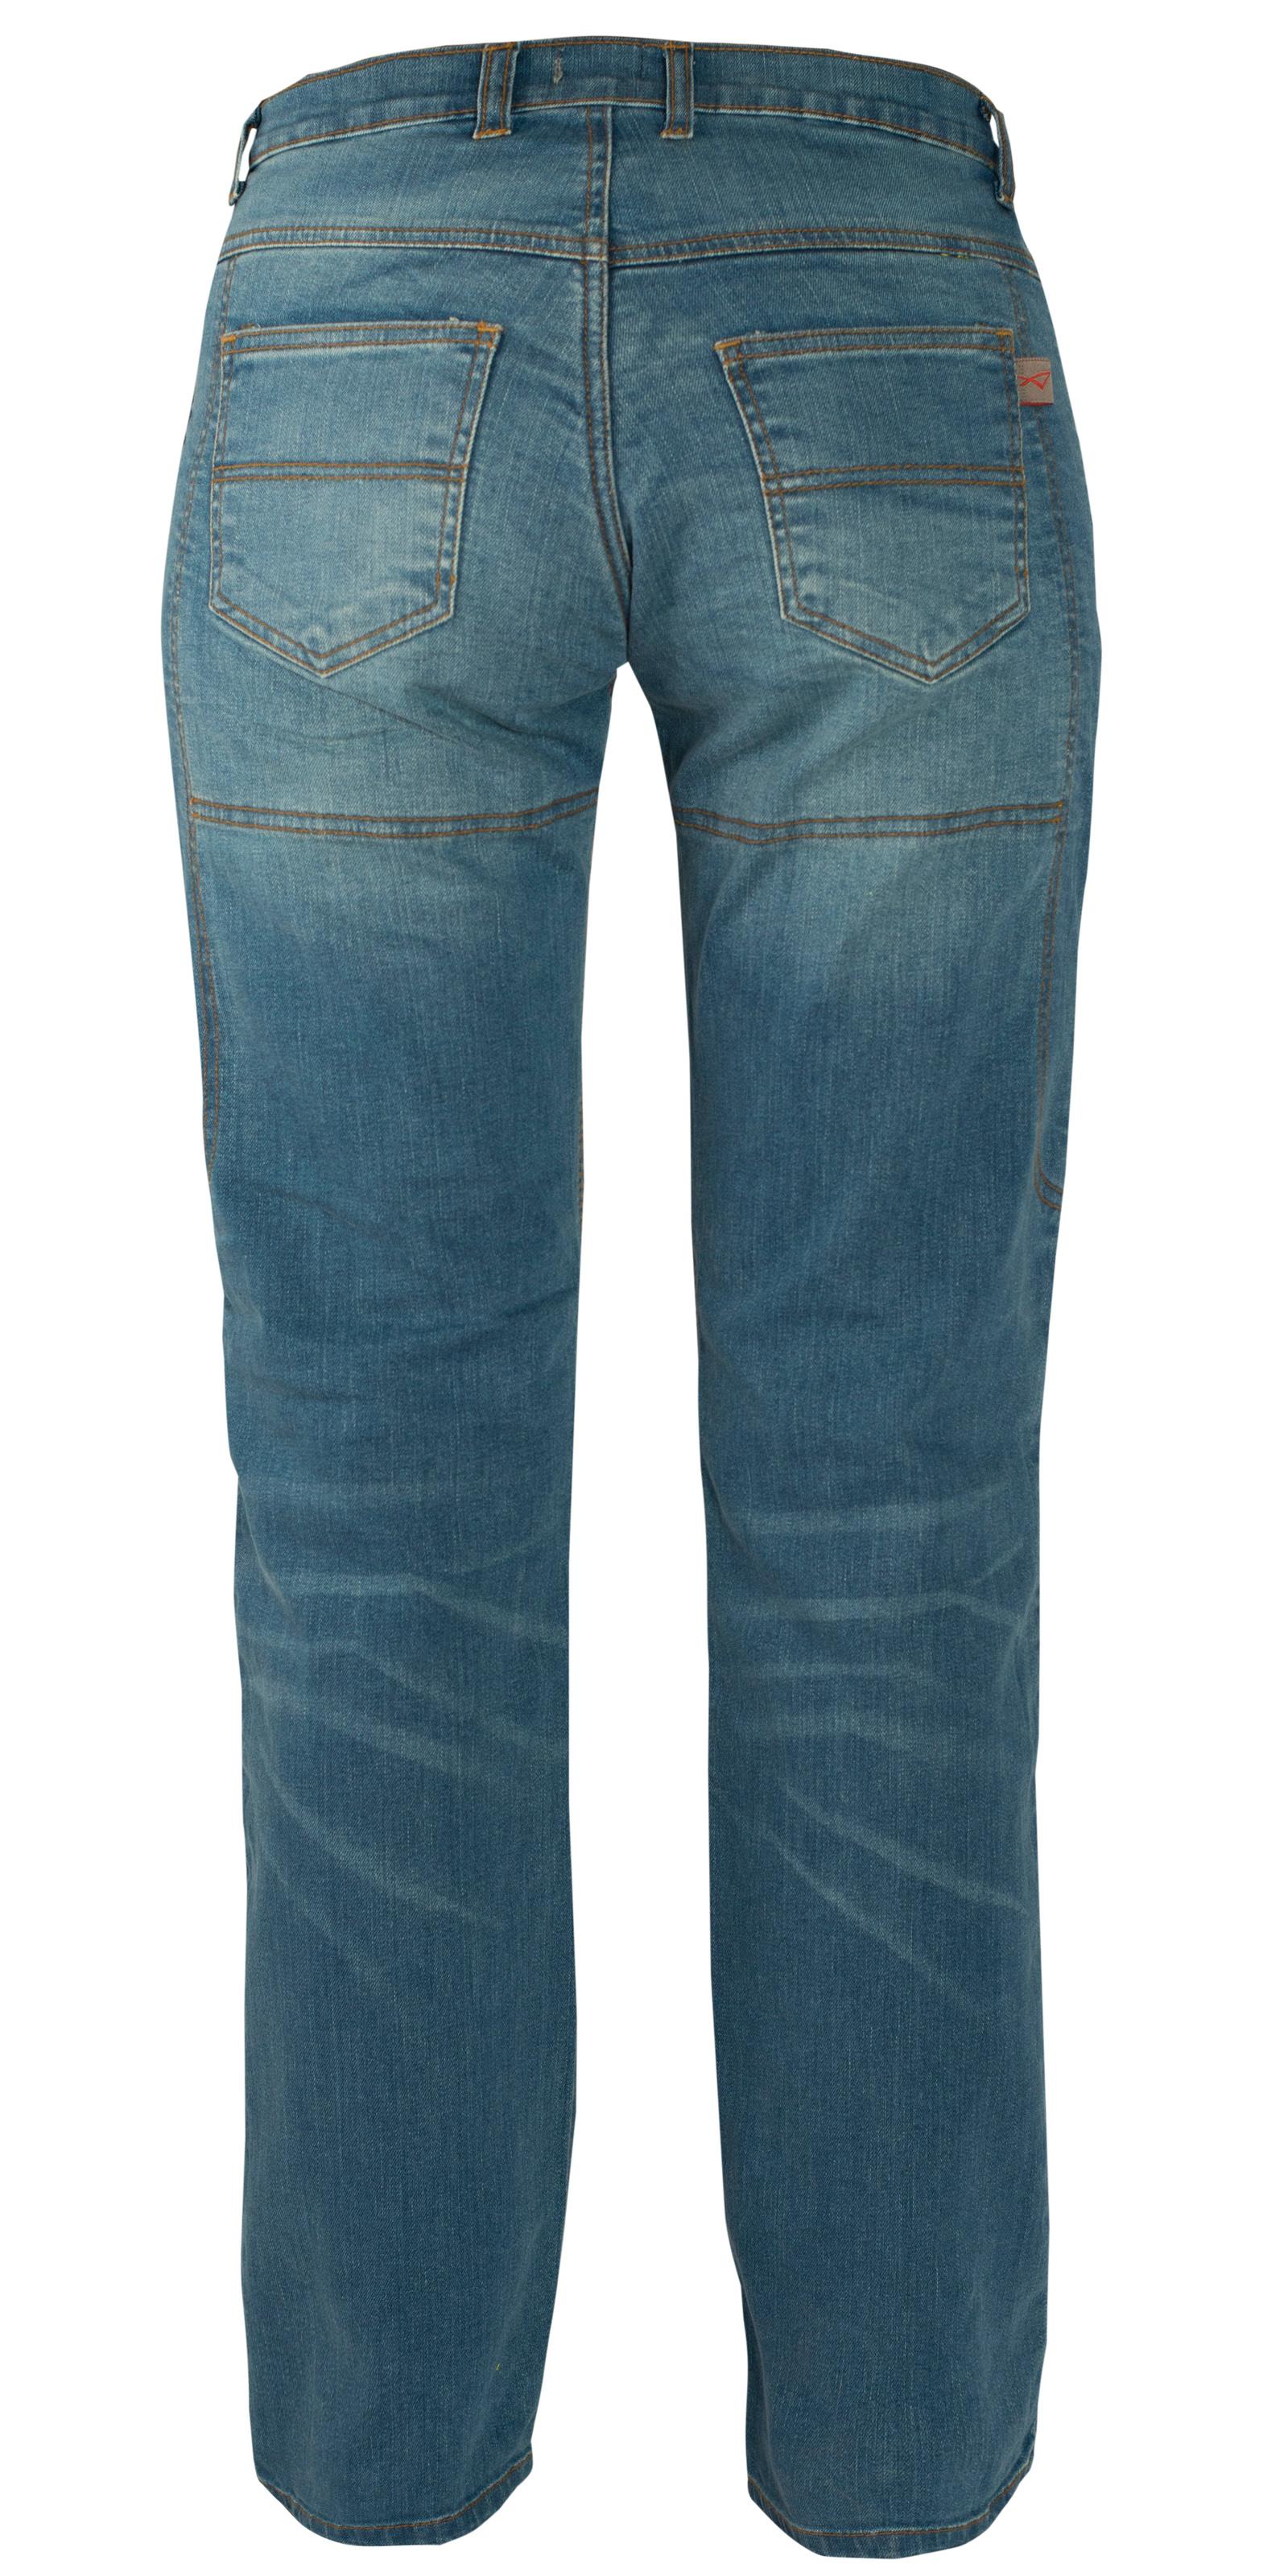 Pantalon-Femme-Jeans-Moto-Protections-Homologees-Renforts-Bleu miniature 7